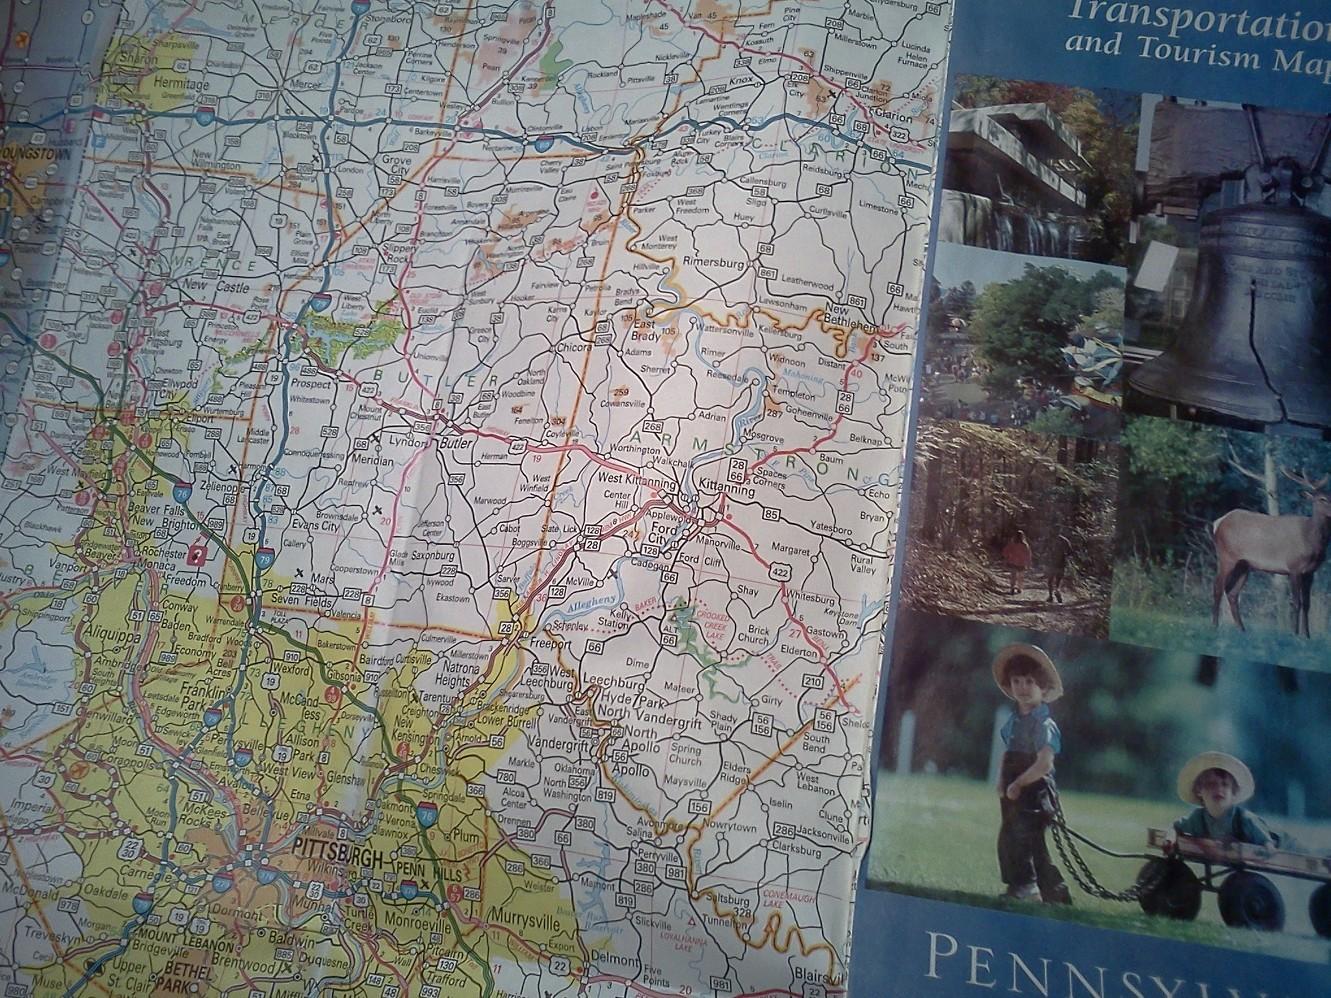 Map, Travel, Tourism, Drive, Interstates